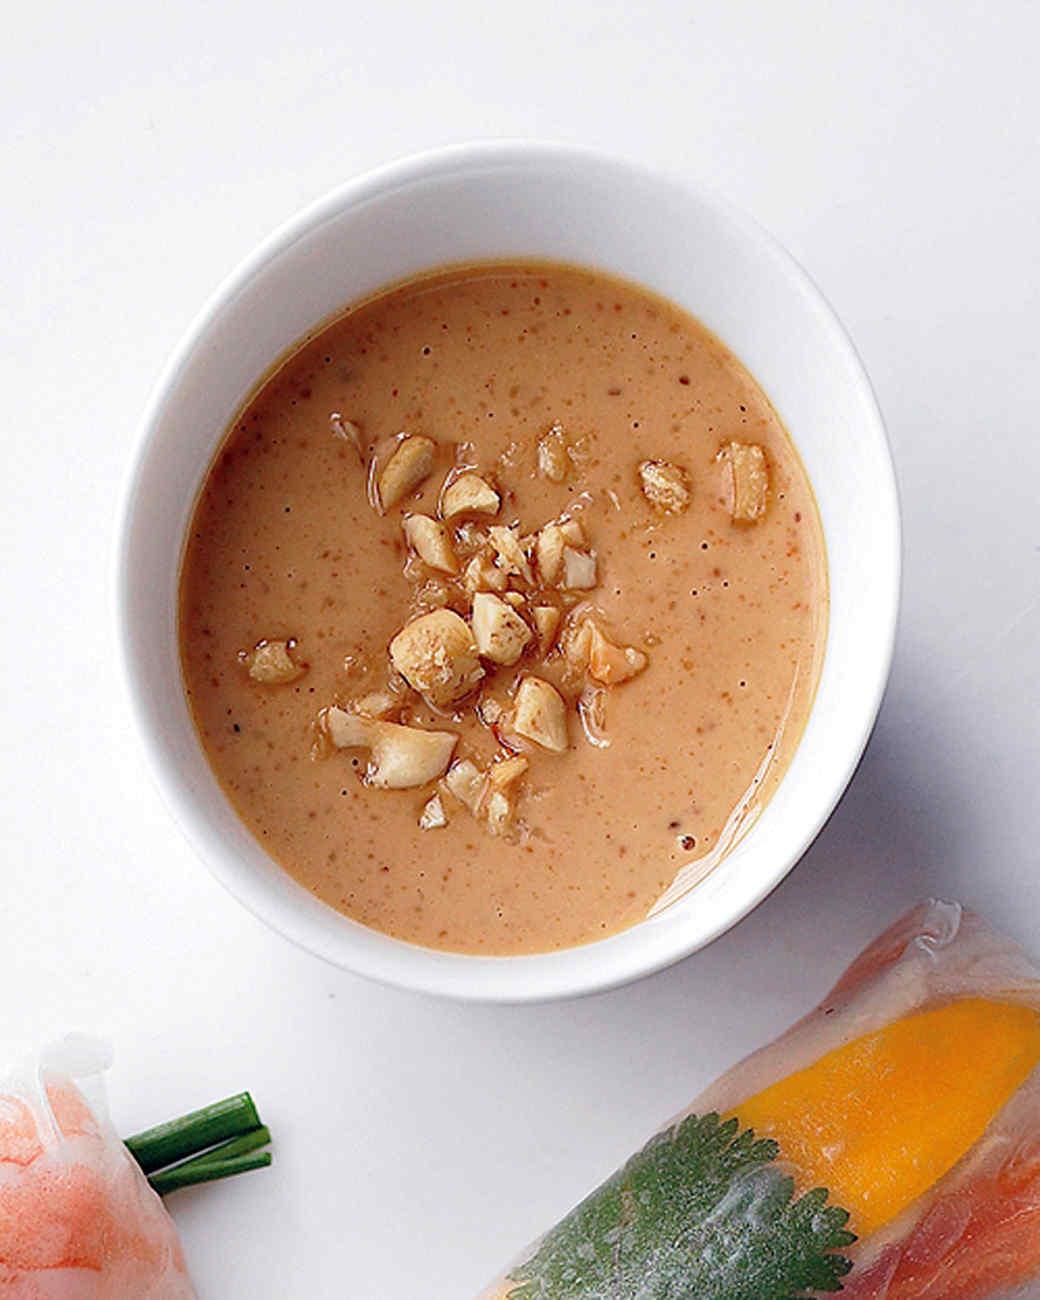 Creamy Peanut Dipping Sauce